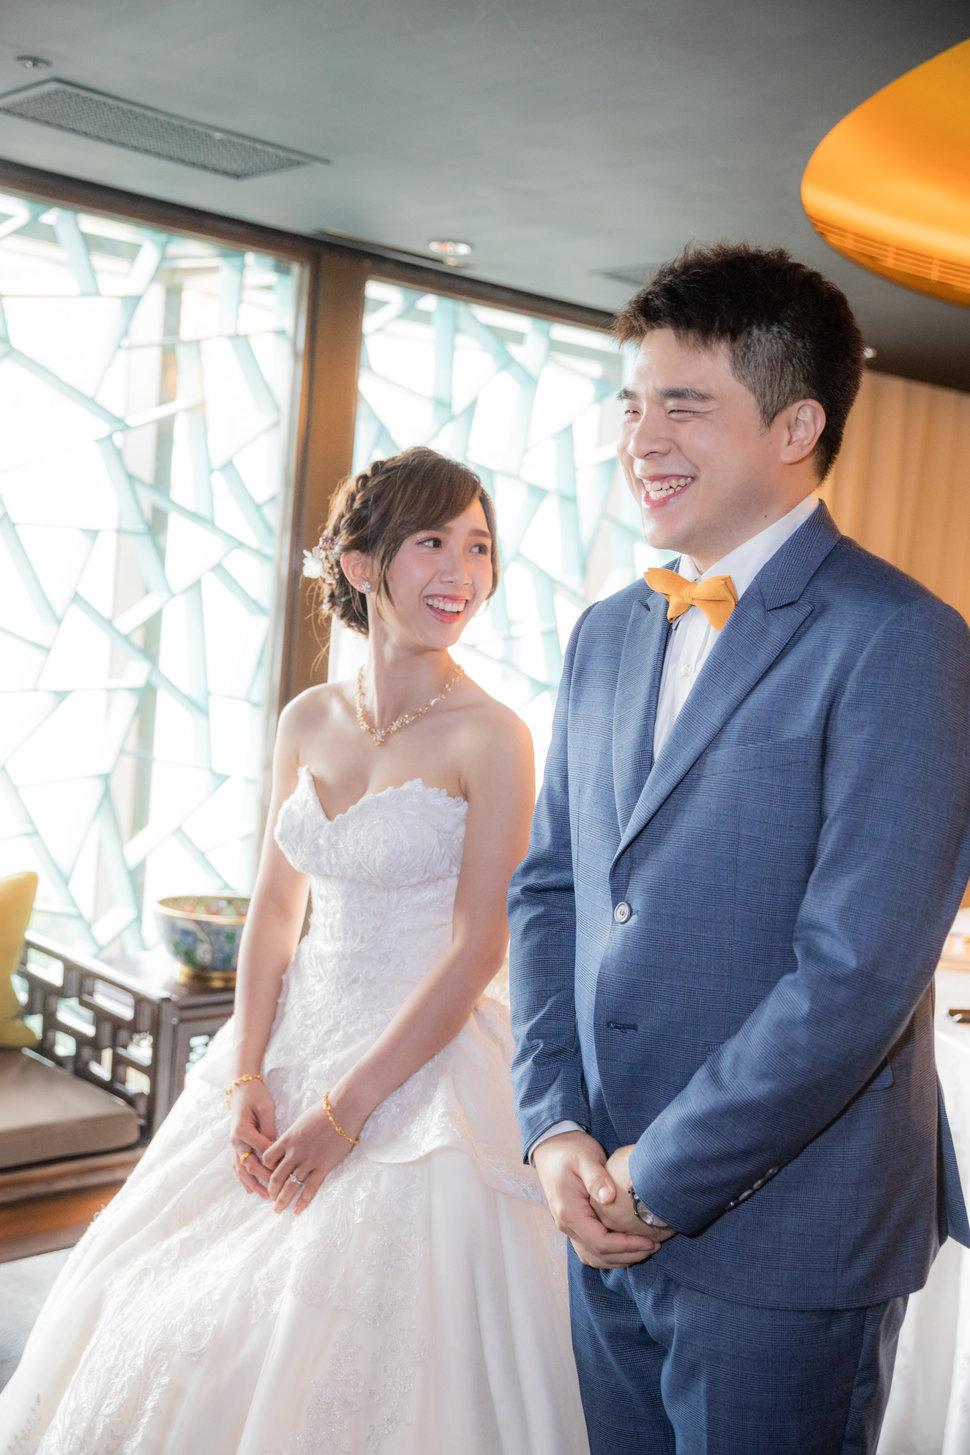 0923-25 - 達特瑋攝影Wei Photography《結婚吧》